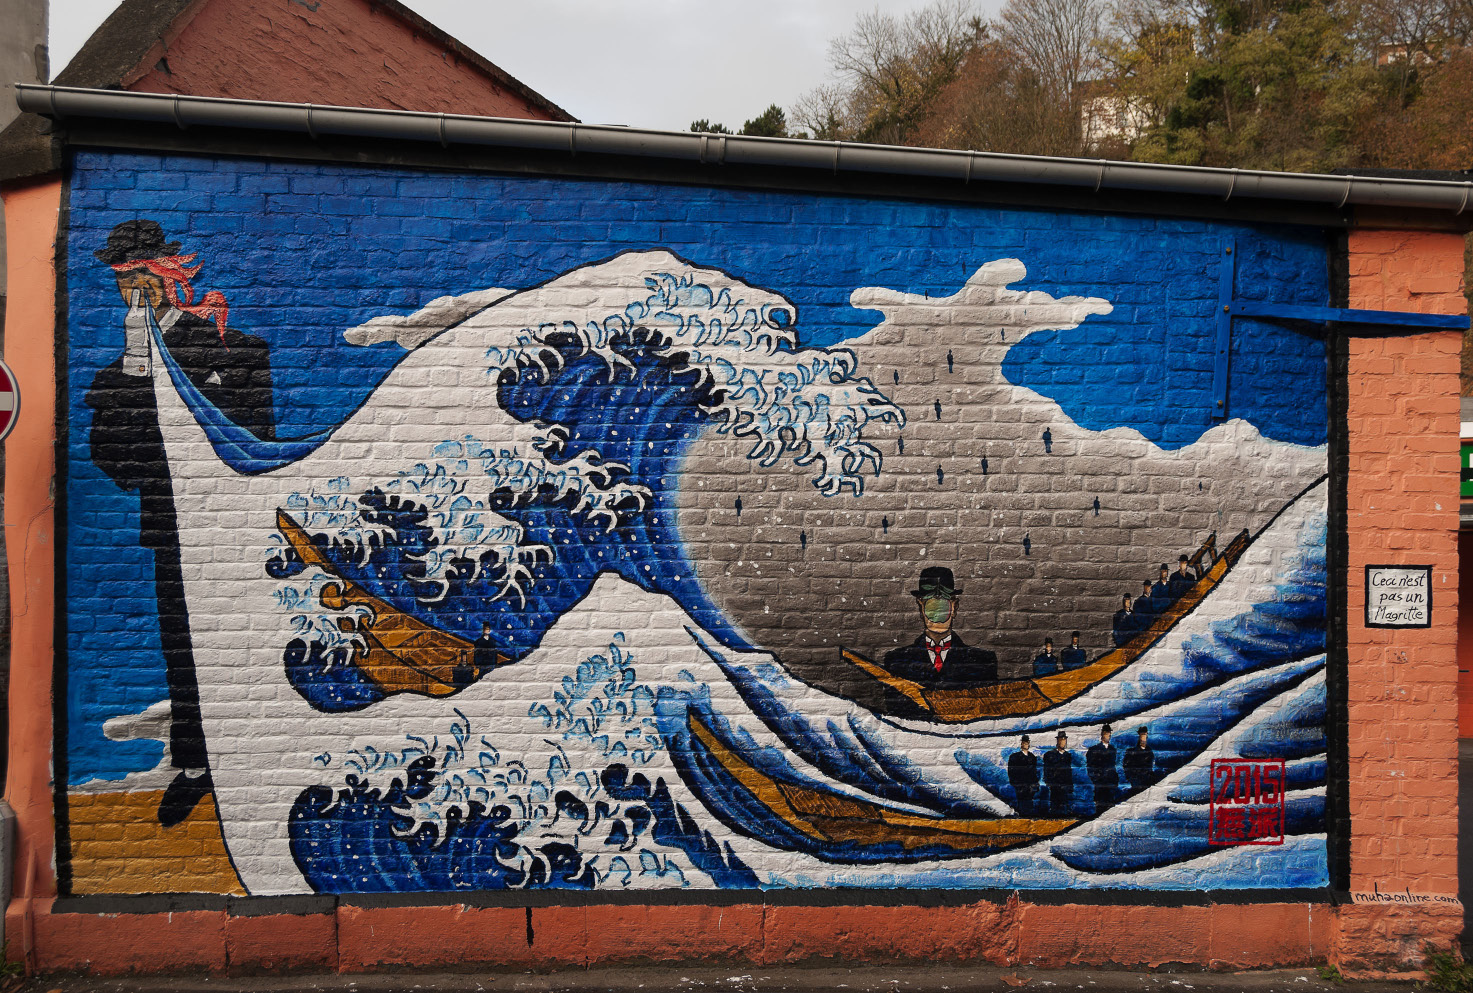 Ceci n'est pas un Magritte or The Great Wave of Verviers